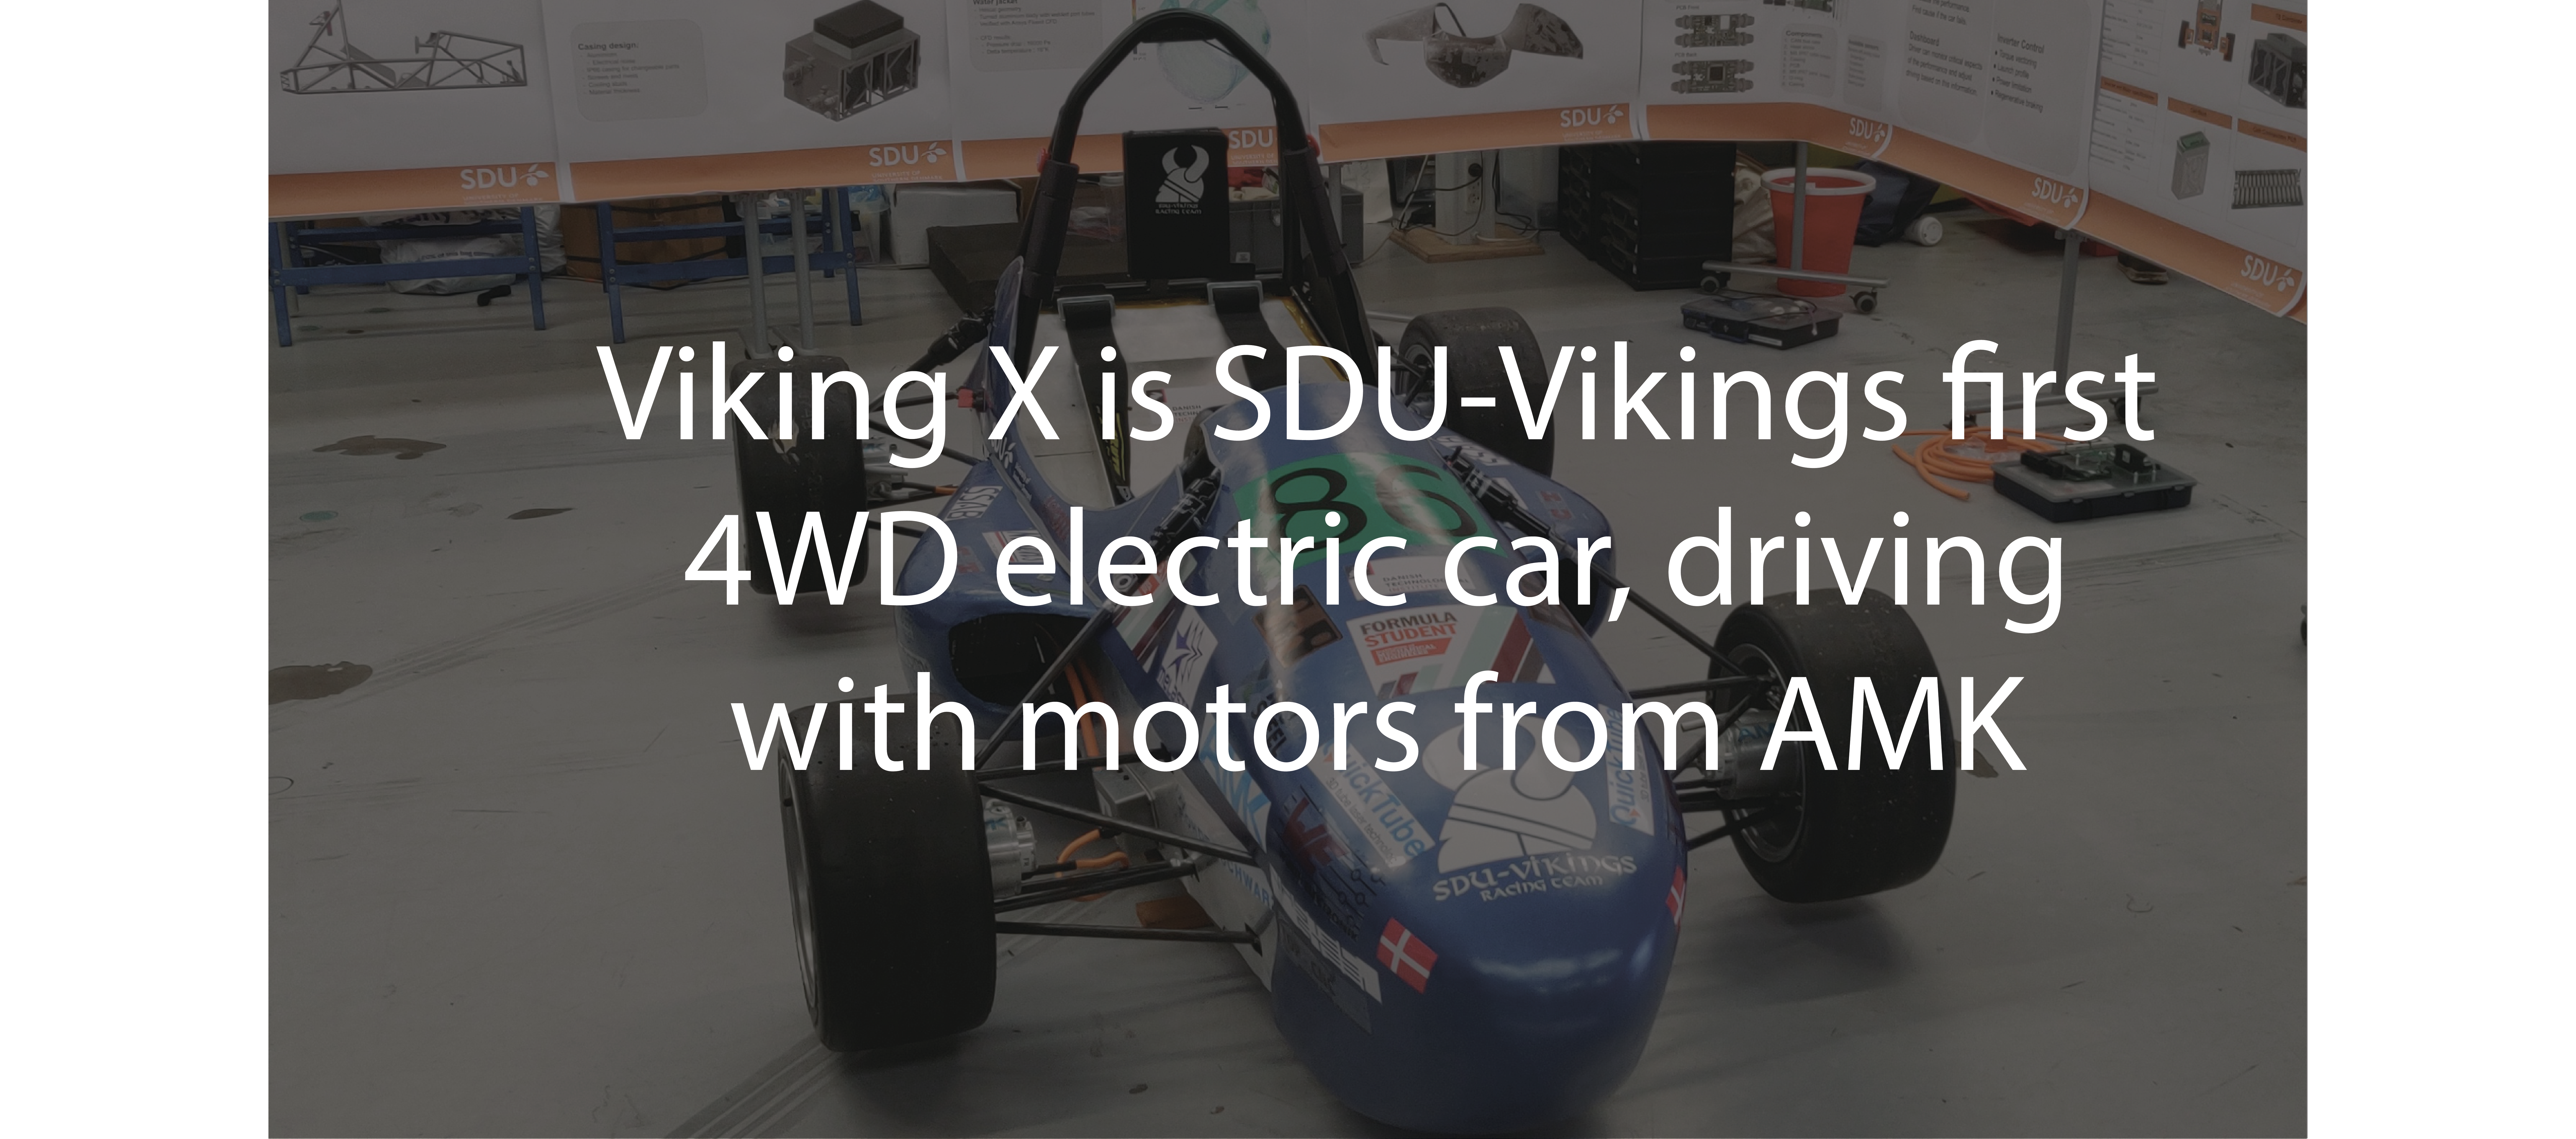 DYK_Viking_X_first_4WD